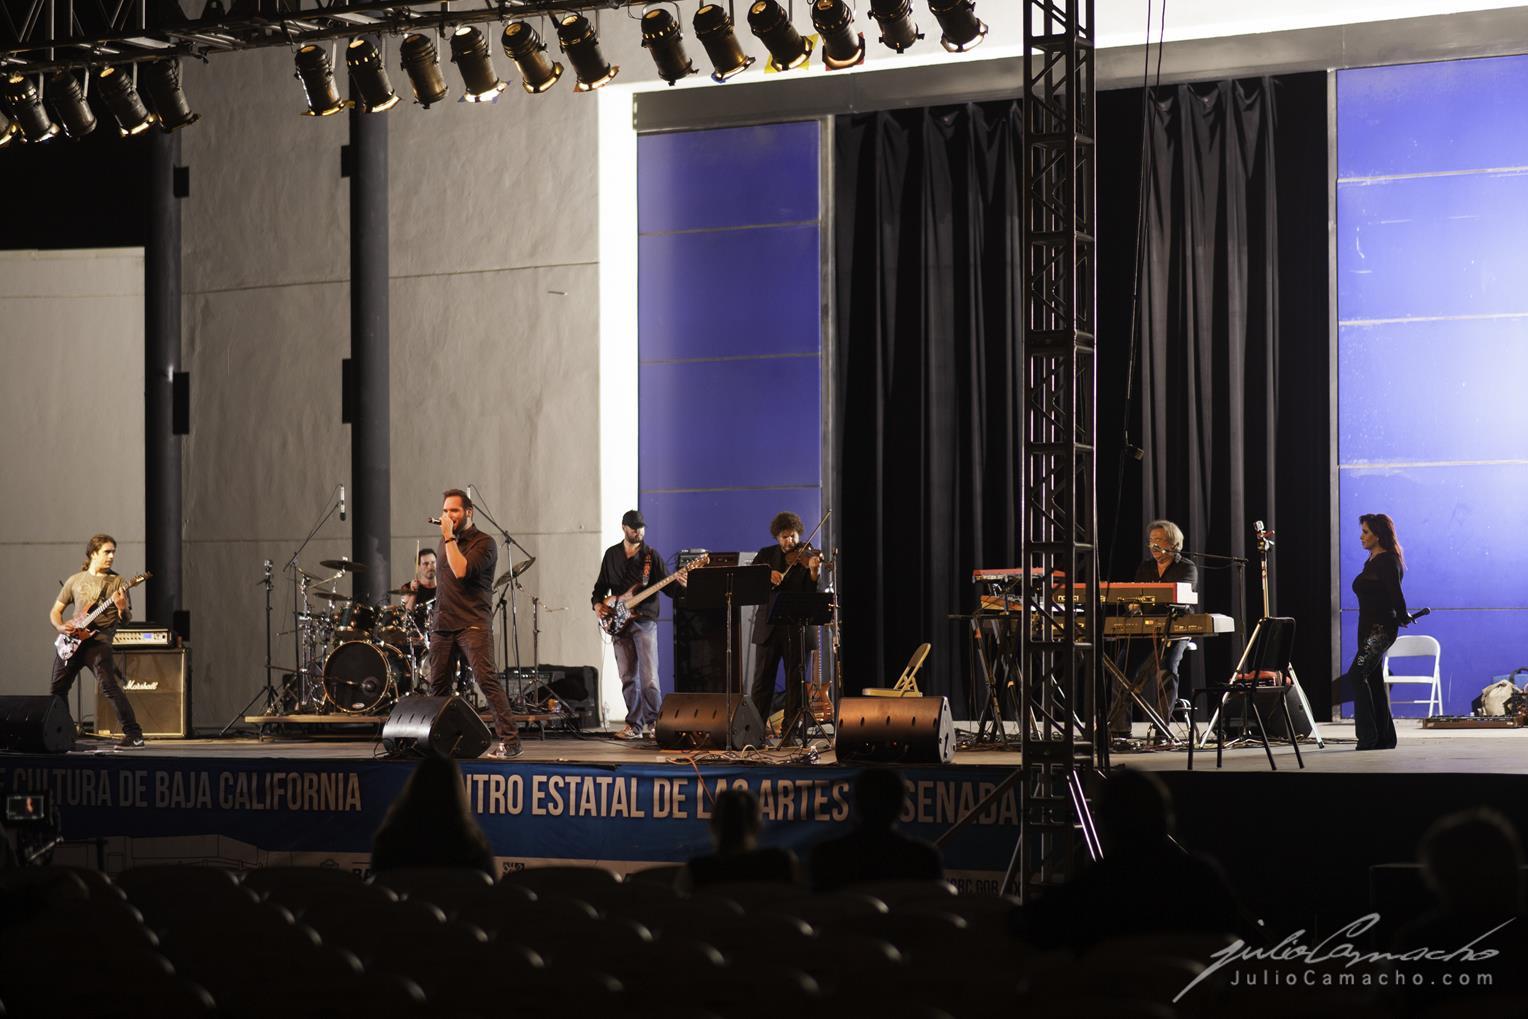 2014-10-30 31 CAST TOUR Ensenada y Tijuana - 0928 - www.Juli (Copy).jpg